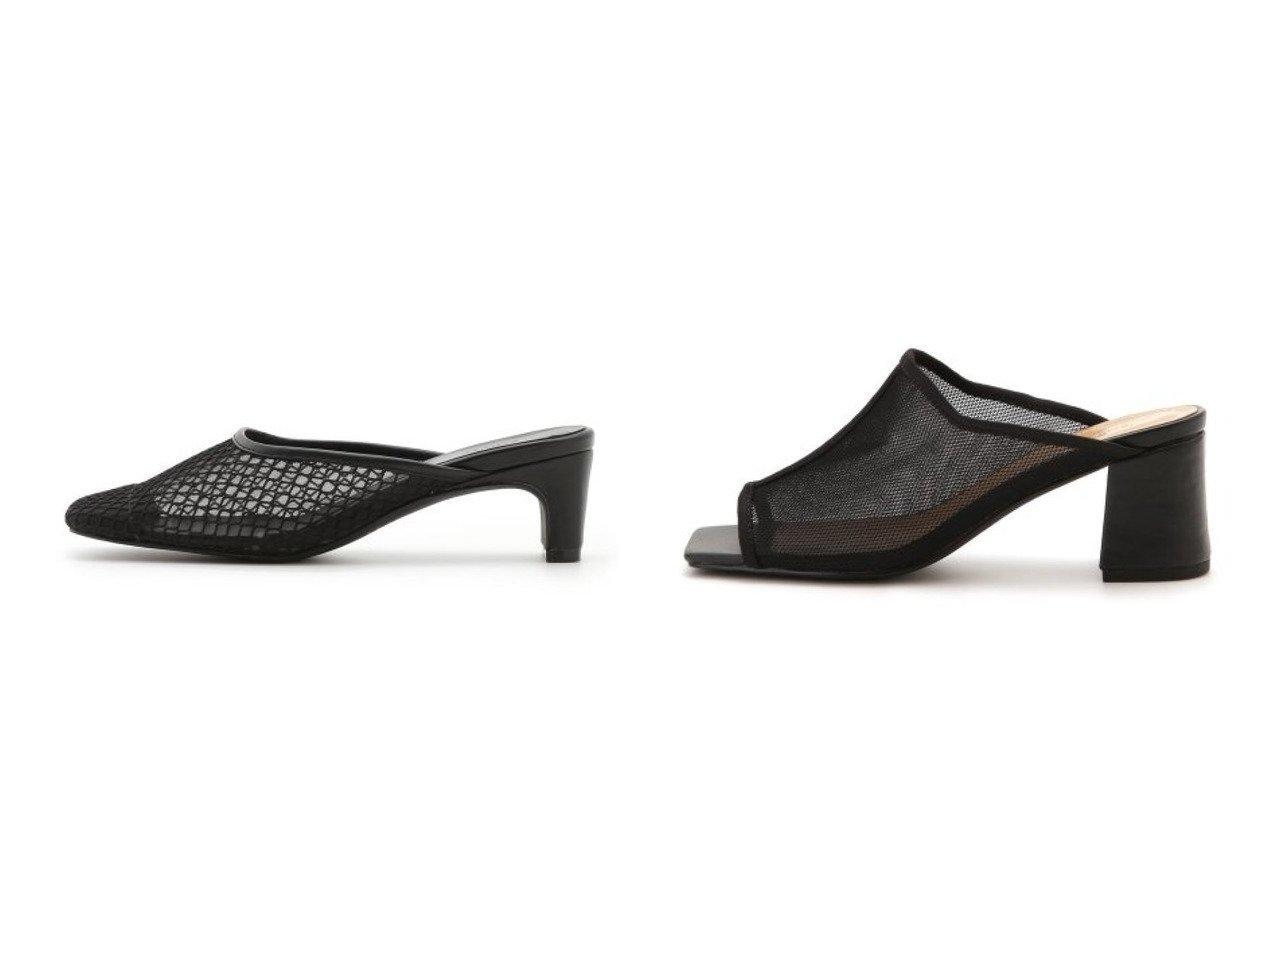 【SNIDEL/スナイデル】のオープントゥサボ&スクエアメッシュサボ シューズ・靴のおすすめ!人気、トレンド・レディースファッションの通販 おすすめで人気の流行・トレンド、ファッションの通販商品 メンズファッション・キッズファッション・インテリア・家具・レディースファッション・服の通販 founy(ファニー) https://founy.com/ ファッション Fashion レディースファッション WOMEN NEW・新作・新着・新入荷 New Arrivals オープントゥ サンダル シューズ スクエア パイソン ミックス ミュール メッシュ 再入荷 Restock/Back in Stock/Re Arrival 春 Spring 1月号 フィット |ID:crp329100000011802